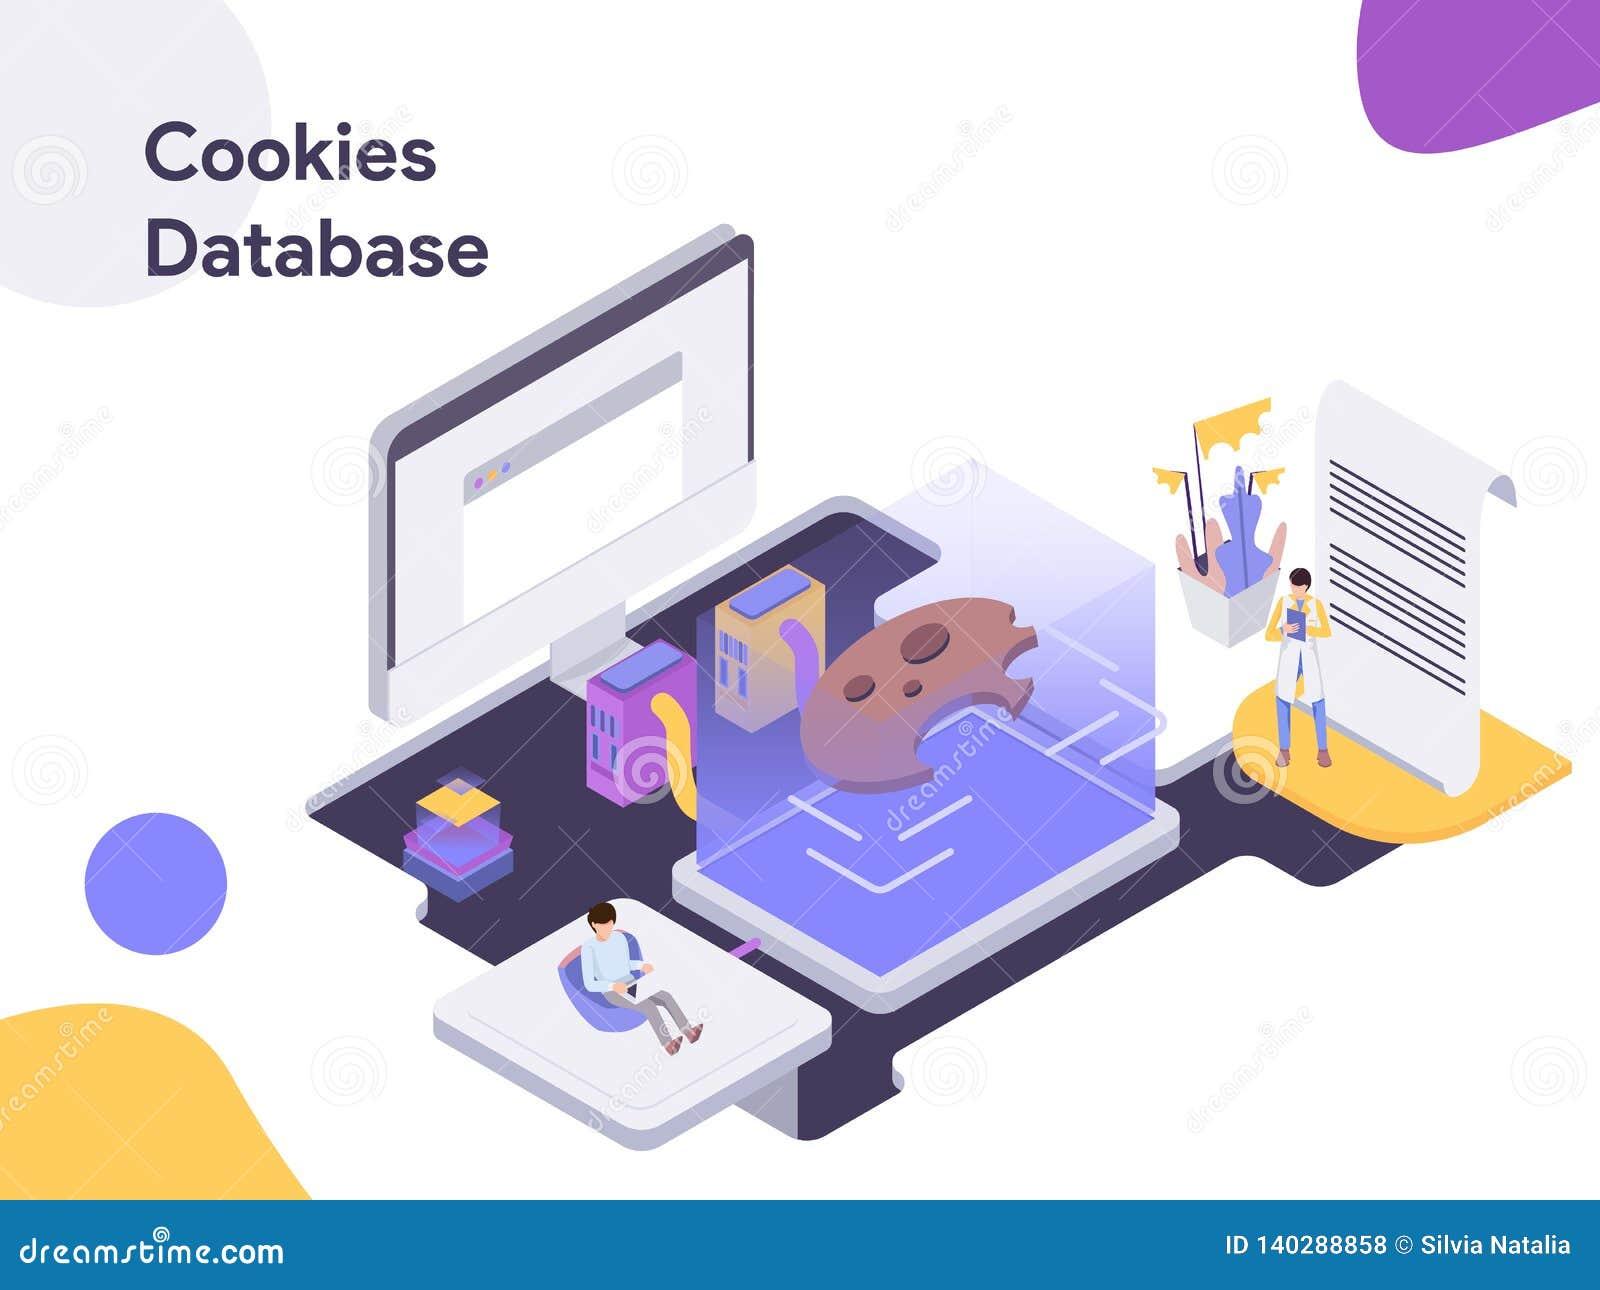 Cookies Database Isometric Illustration  Modern Flat Design